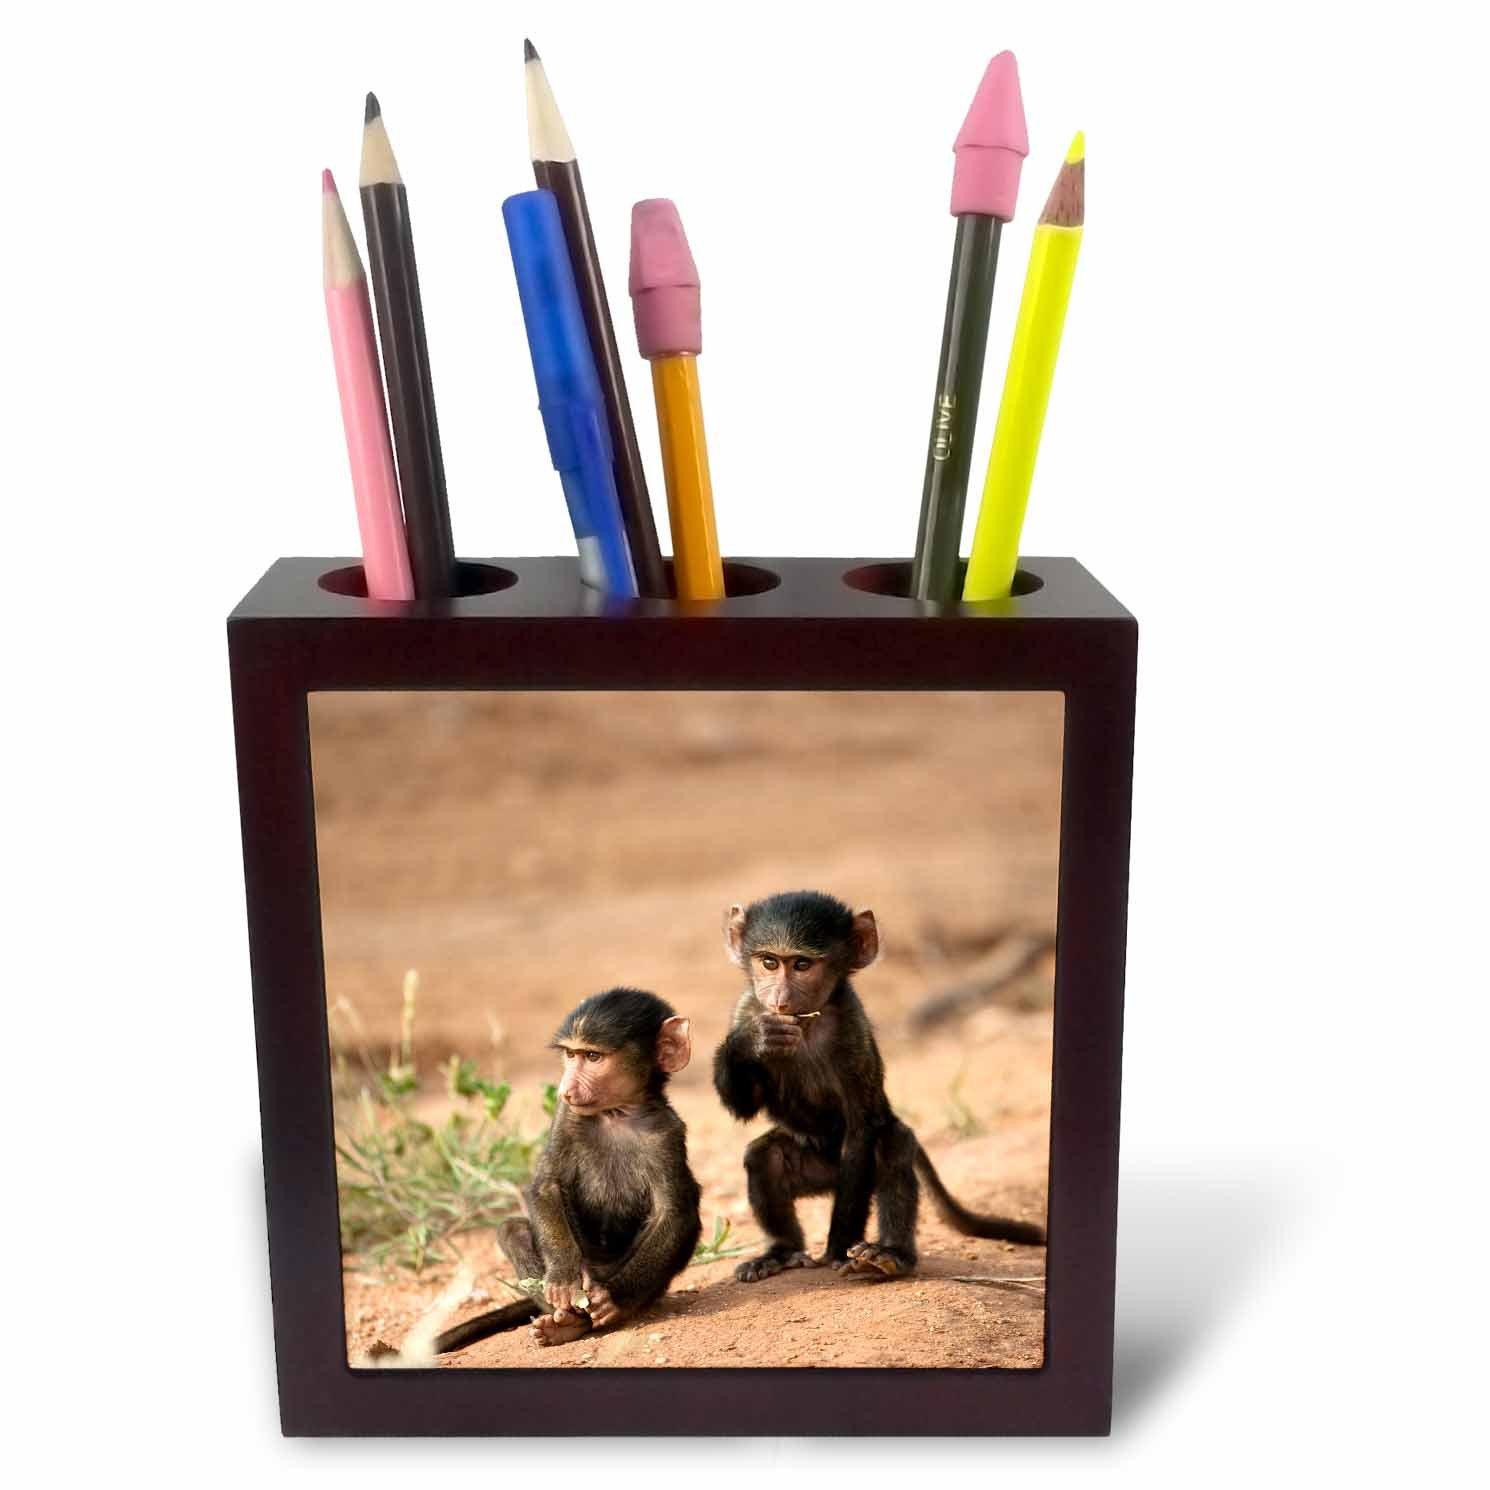 3drose Ph _ 69954 _ 1オリーブBaboon primates、Masai Mara GR、Kenya jmc0184-joeとメアリーアンmcdonald-tileペンホルダー、5インチ B00JSLPU3Y